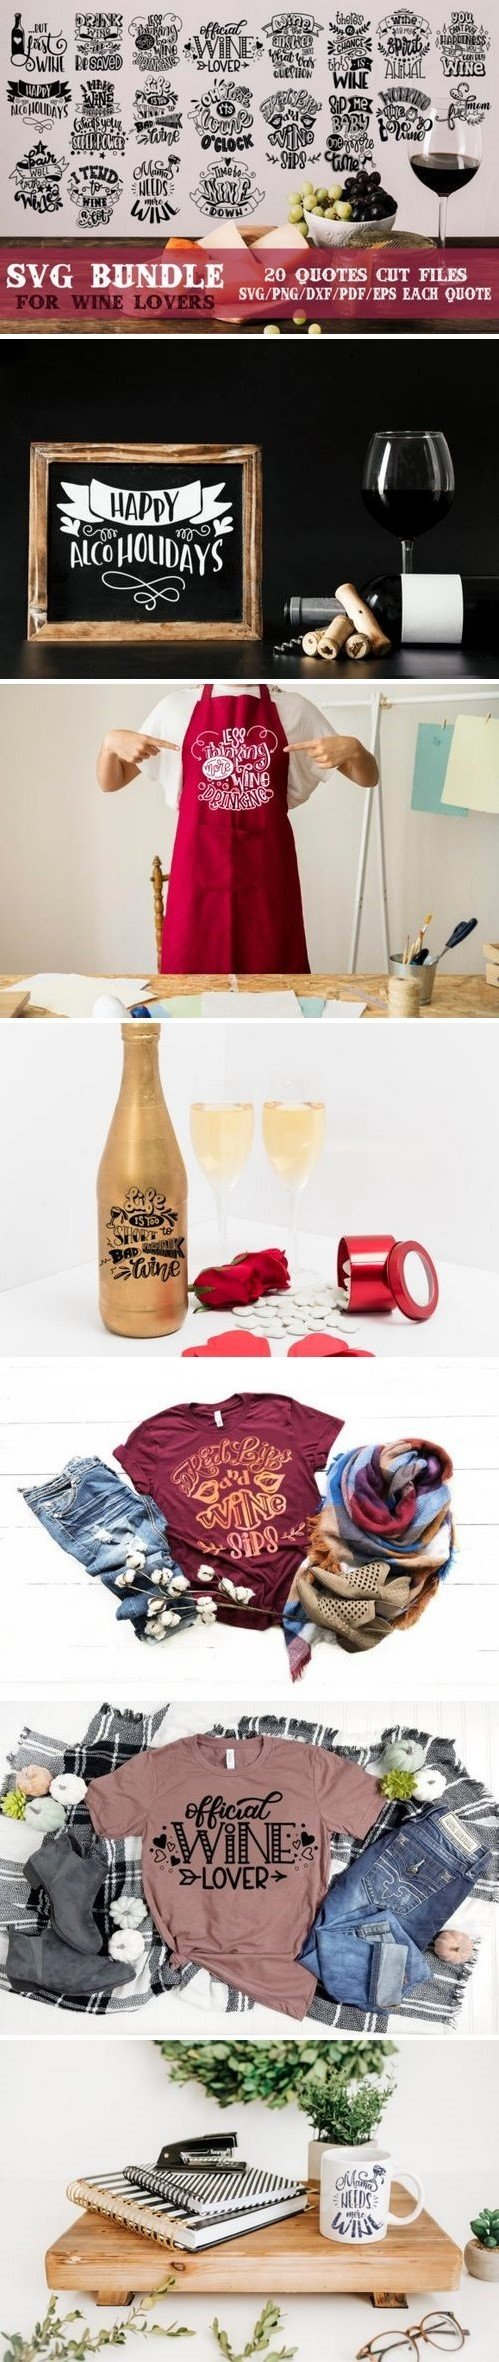 Wine lovers SVG Bundle 894828